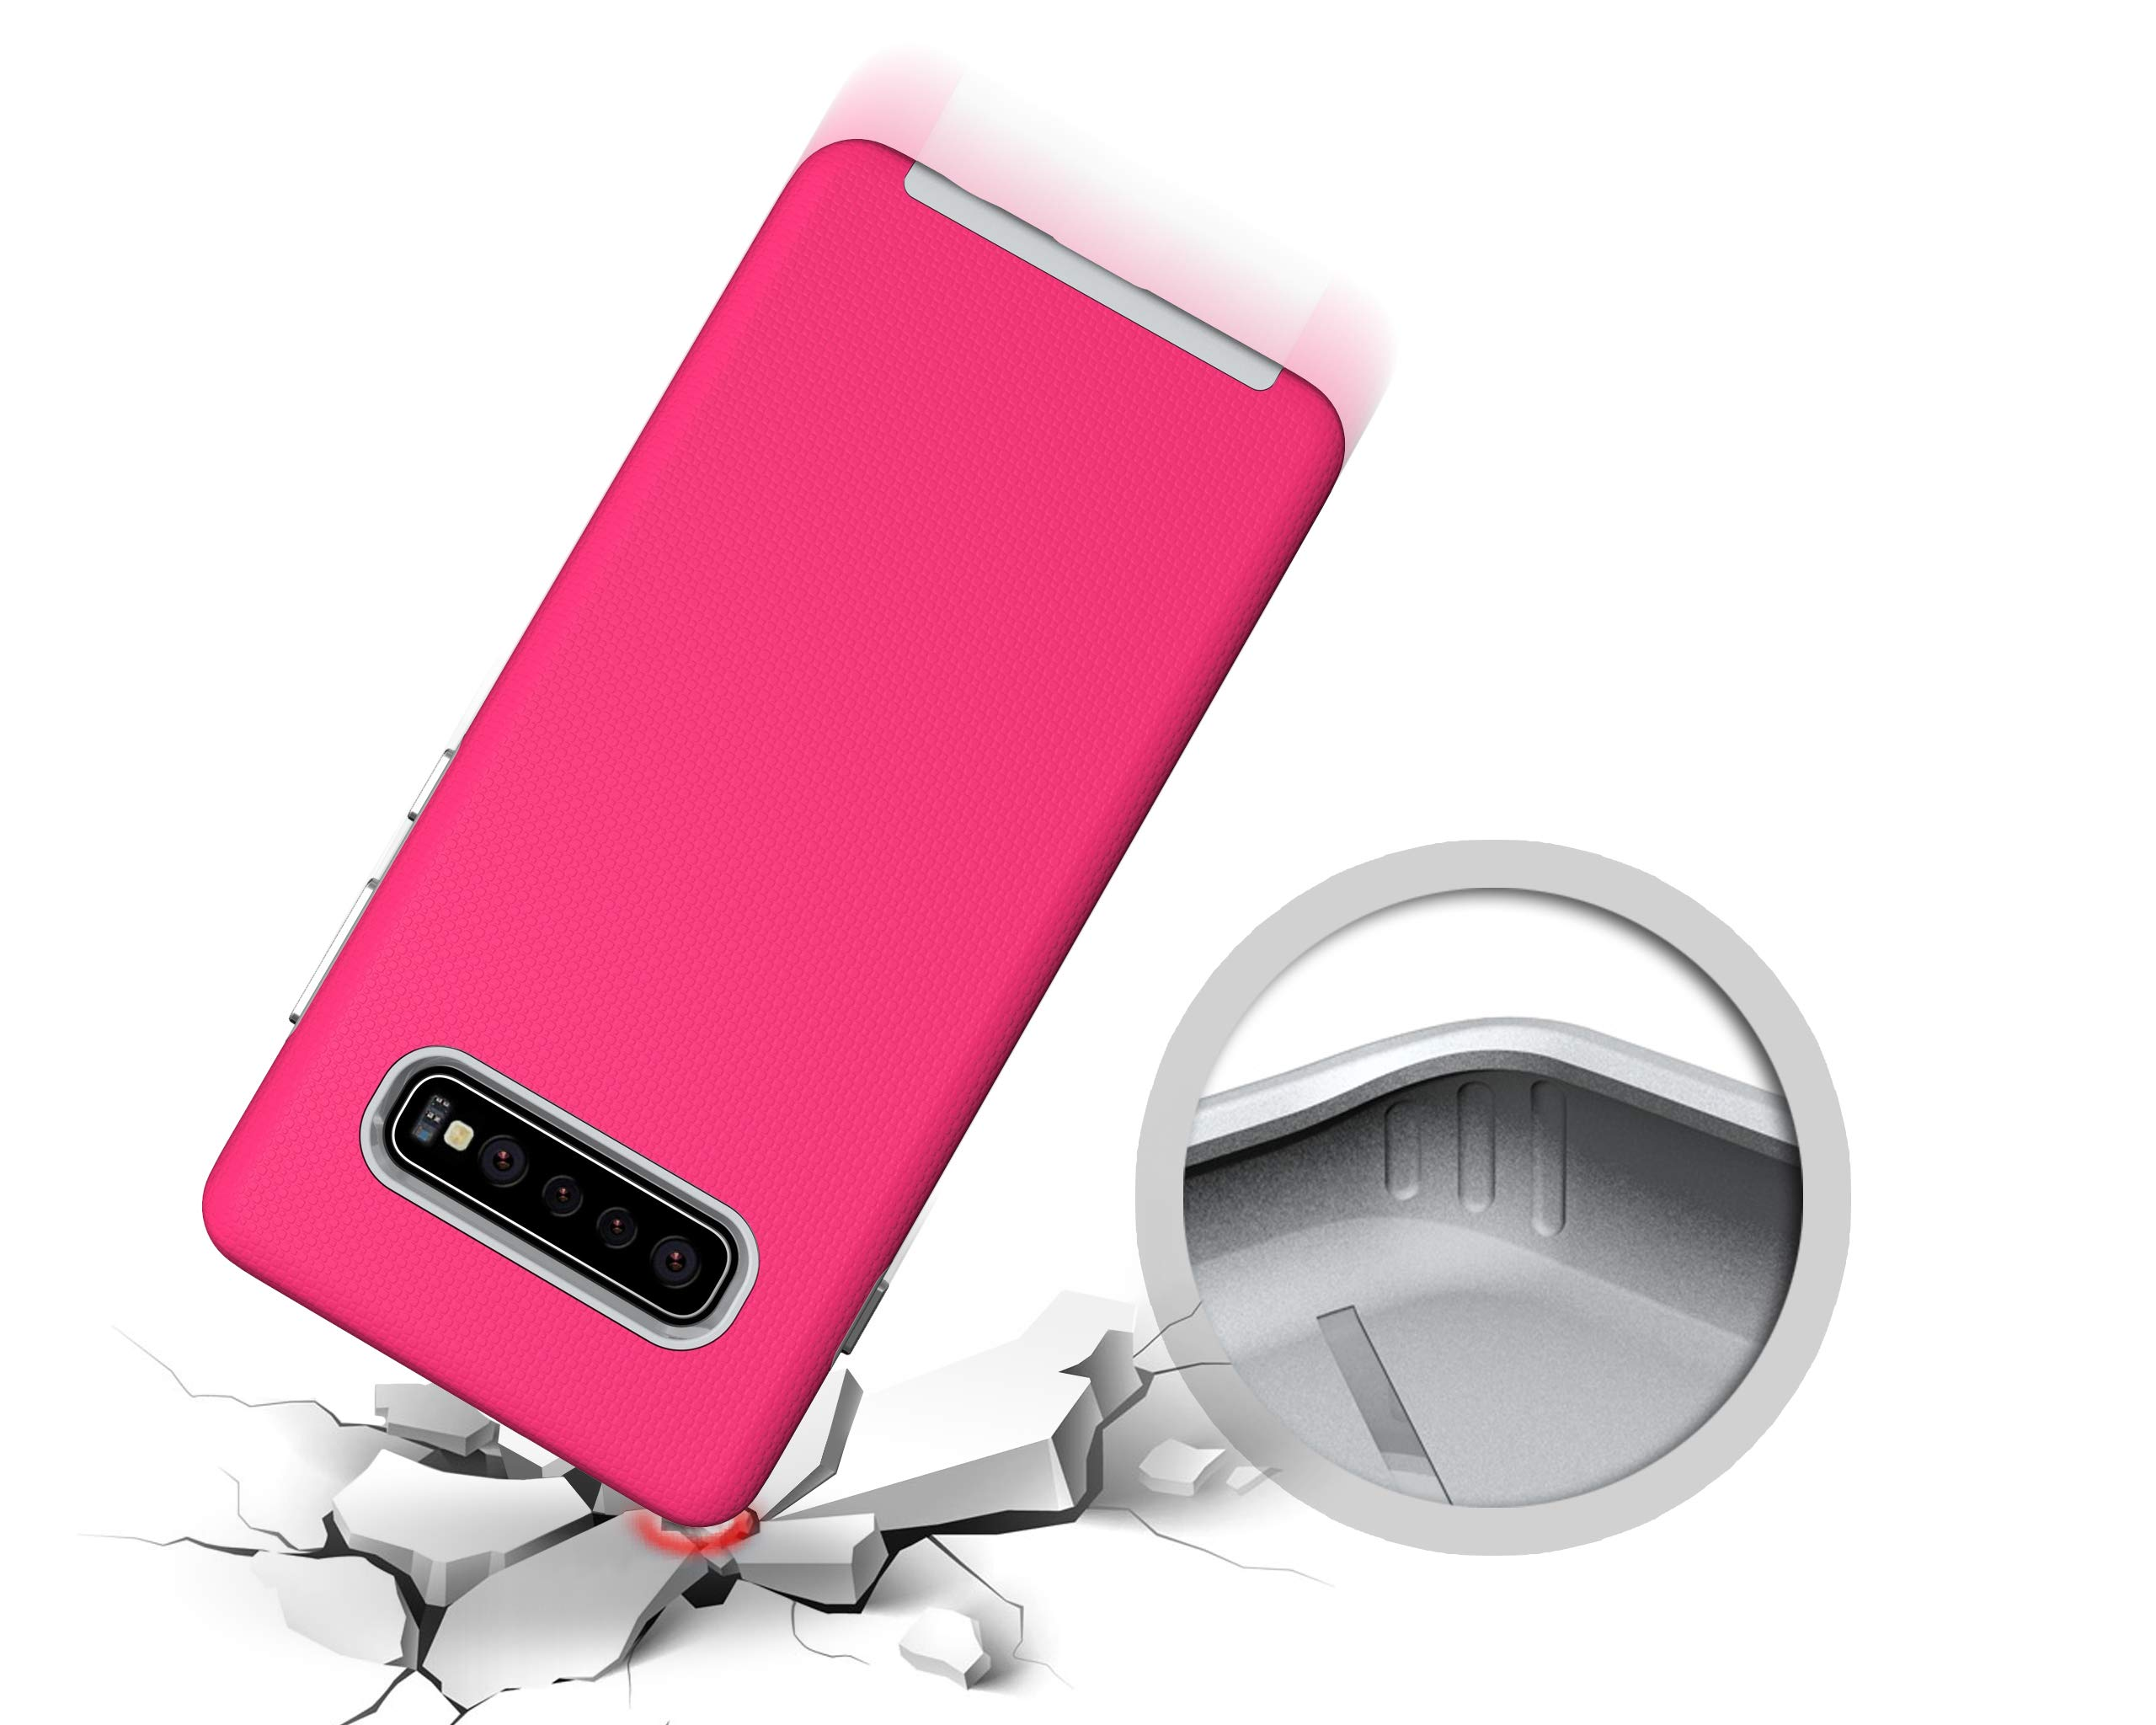 NOMO Galaxy S10 Case,Samsung S10 Hybrid Defender Armor Case,Dual Layer Protective Phone Case,Full Body Rugged Case,Non-Slip Drop Protection Shock Proof Case for Samsung Galaxy S10 Hot Pink by NOMO (Image #2)